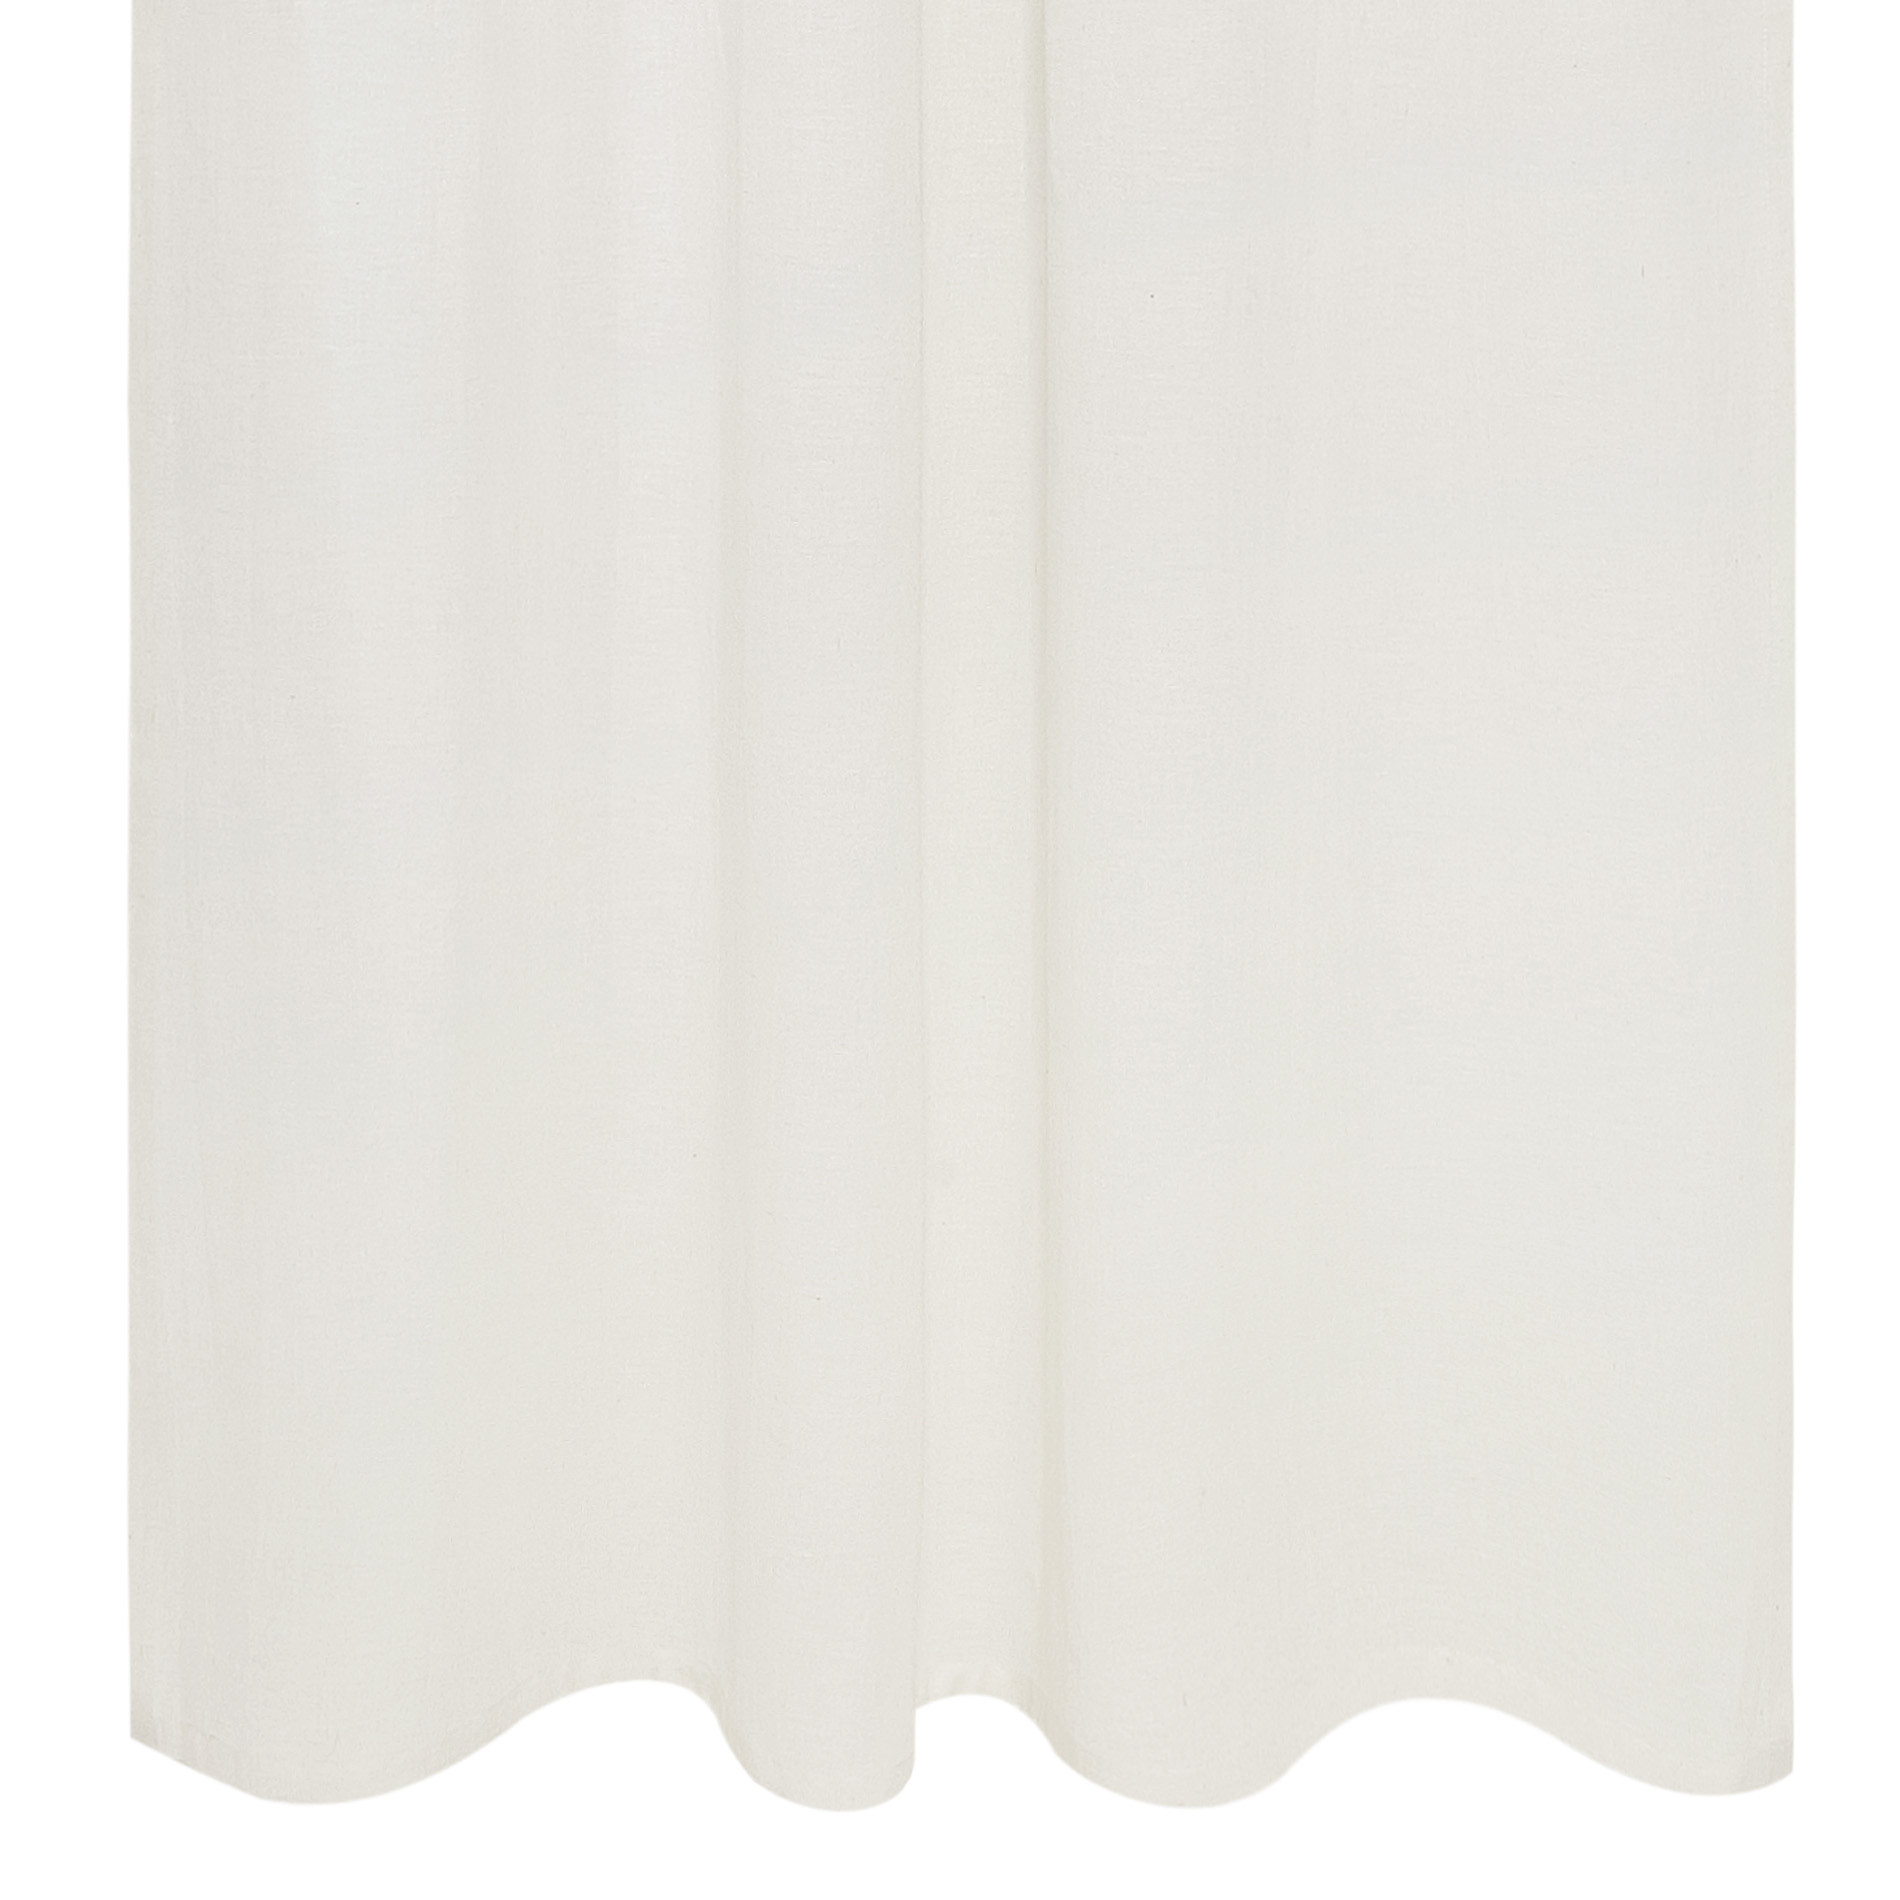 Tenda misto lino con passanti nascosti, Bianco, large image number 2